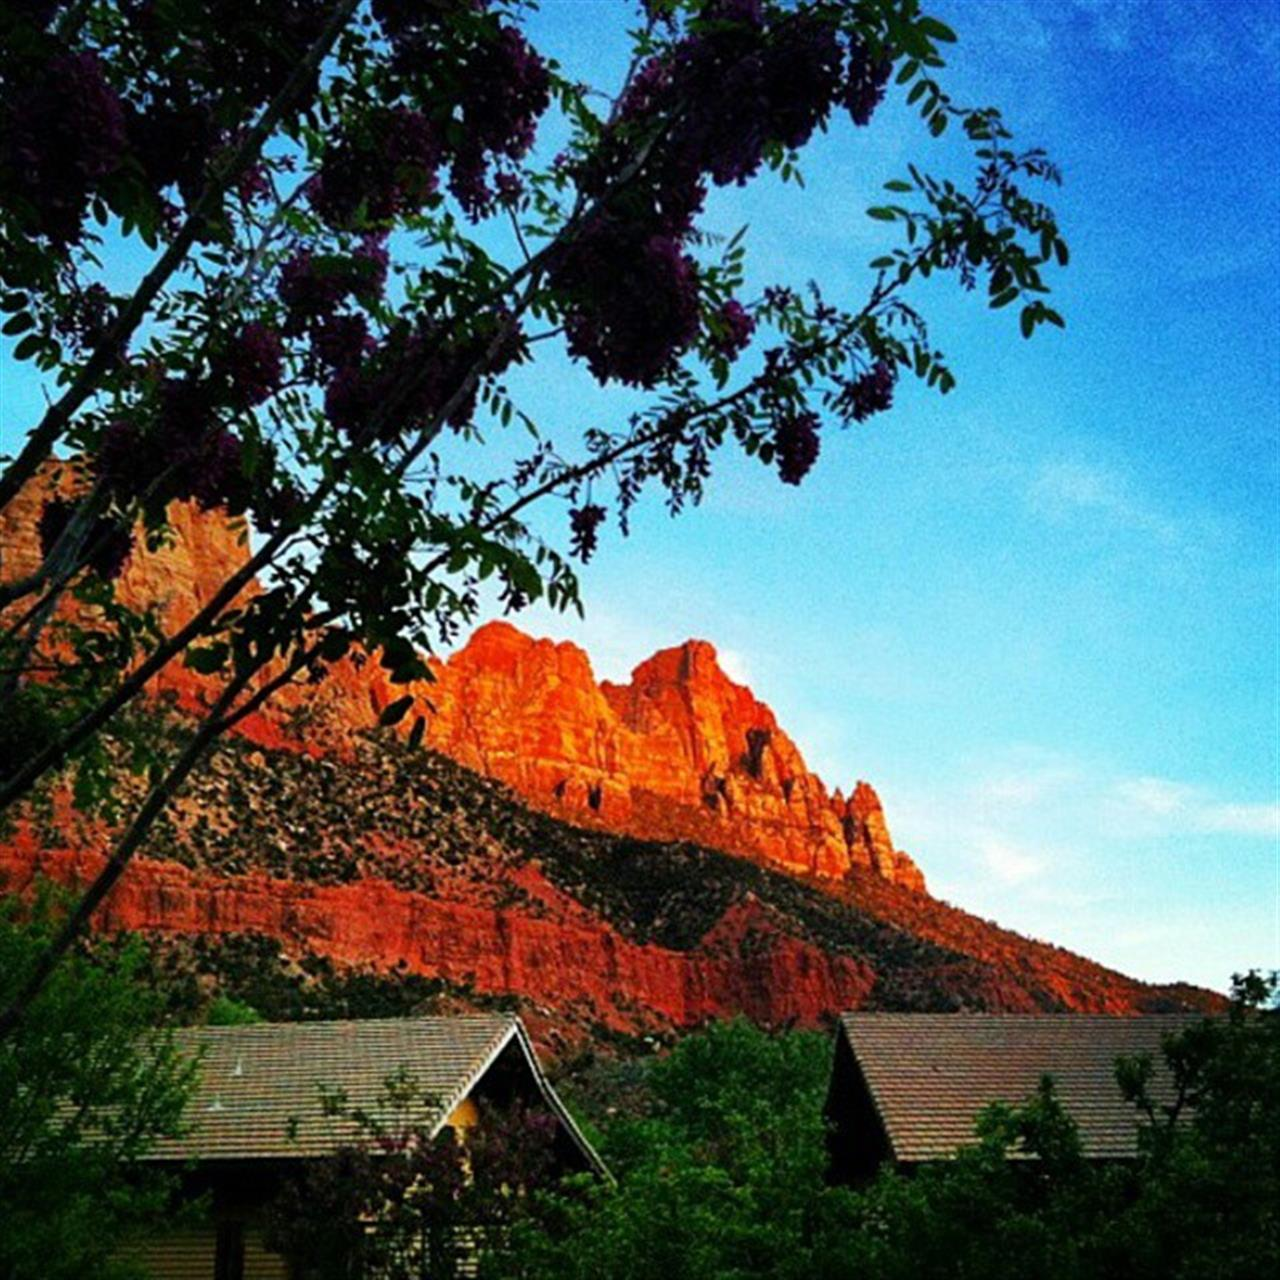 Take advantage of spring in Southern Utah!